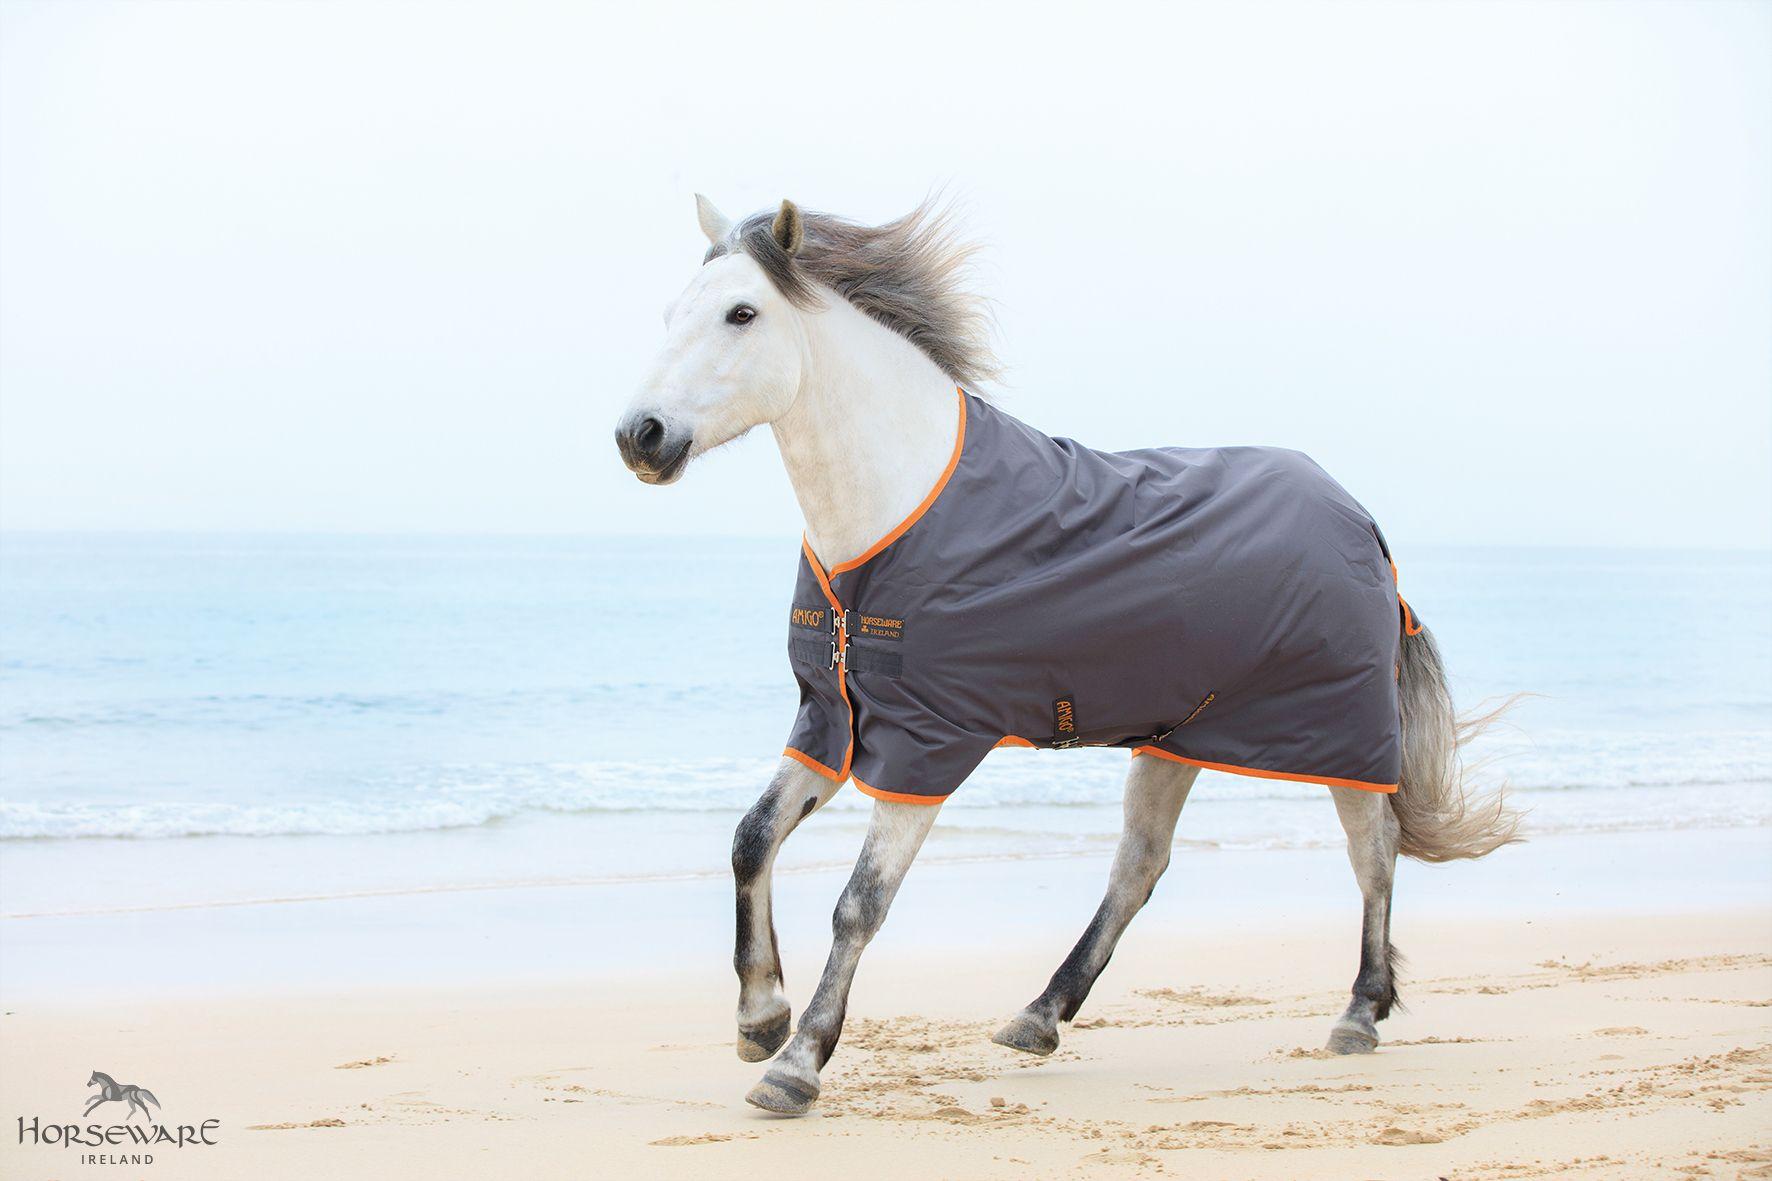 Amigo Hero 6 Turnout Visit Www Horseware Com To Find Your Nearest Stockist Grey Horse Horses Horse Rider